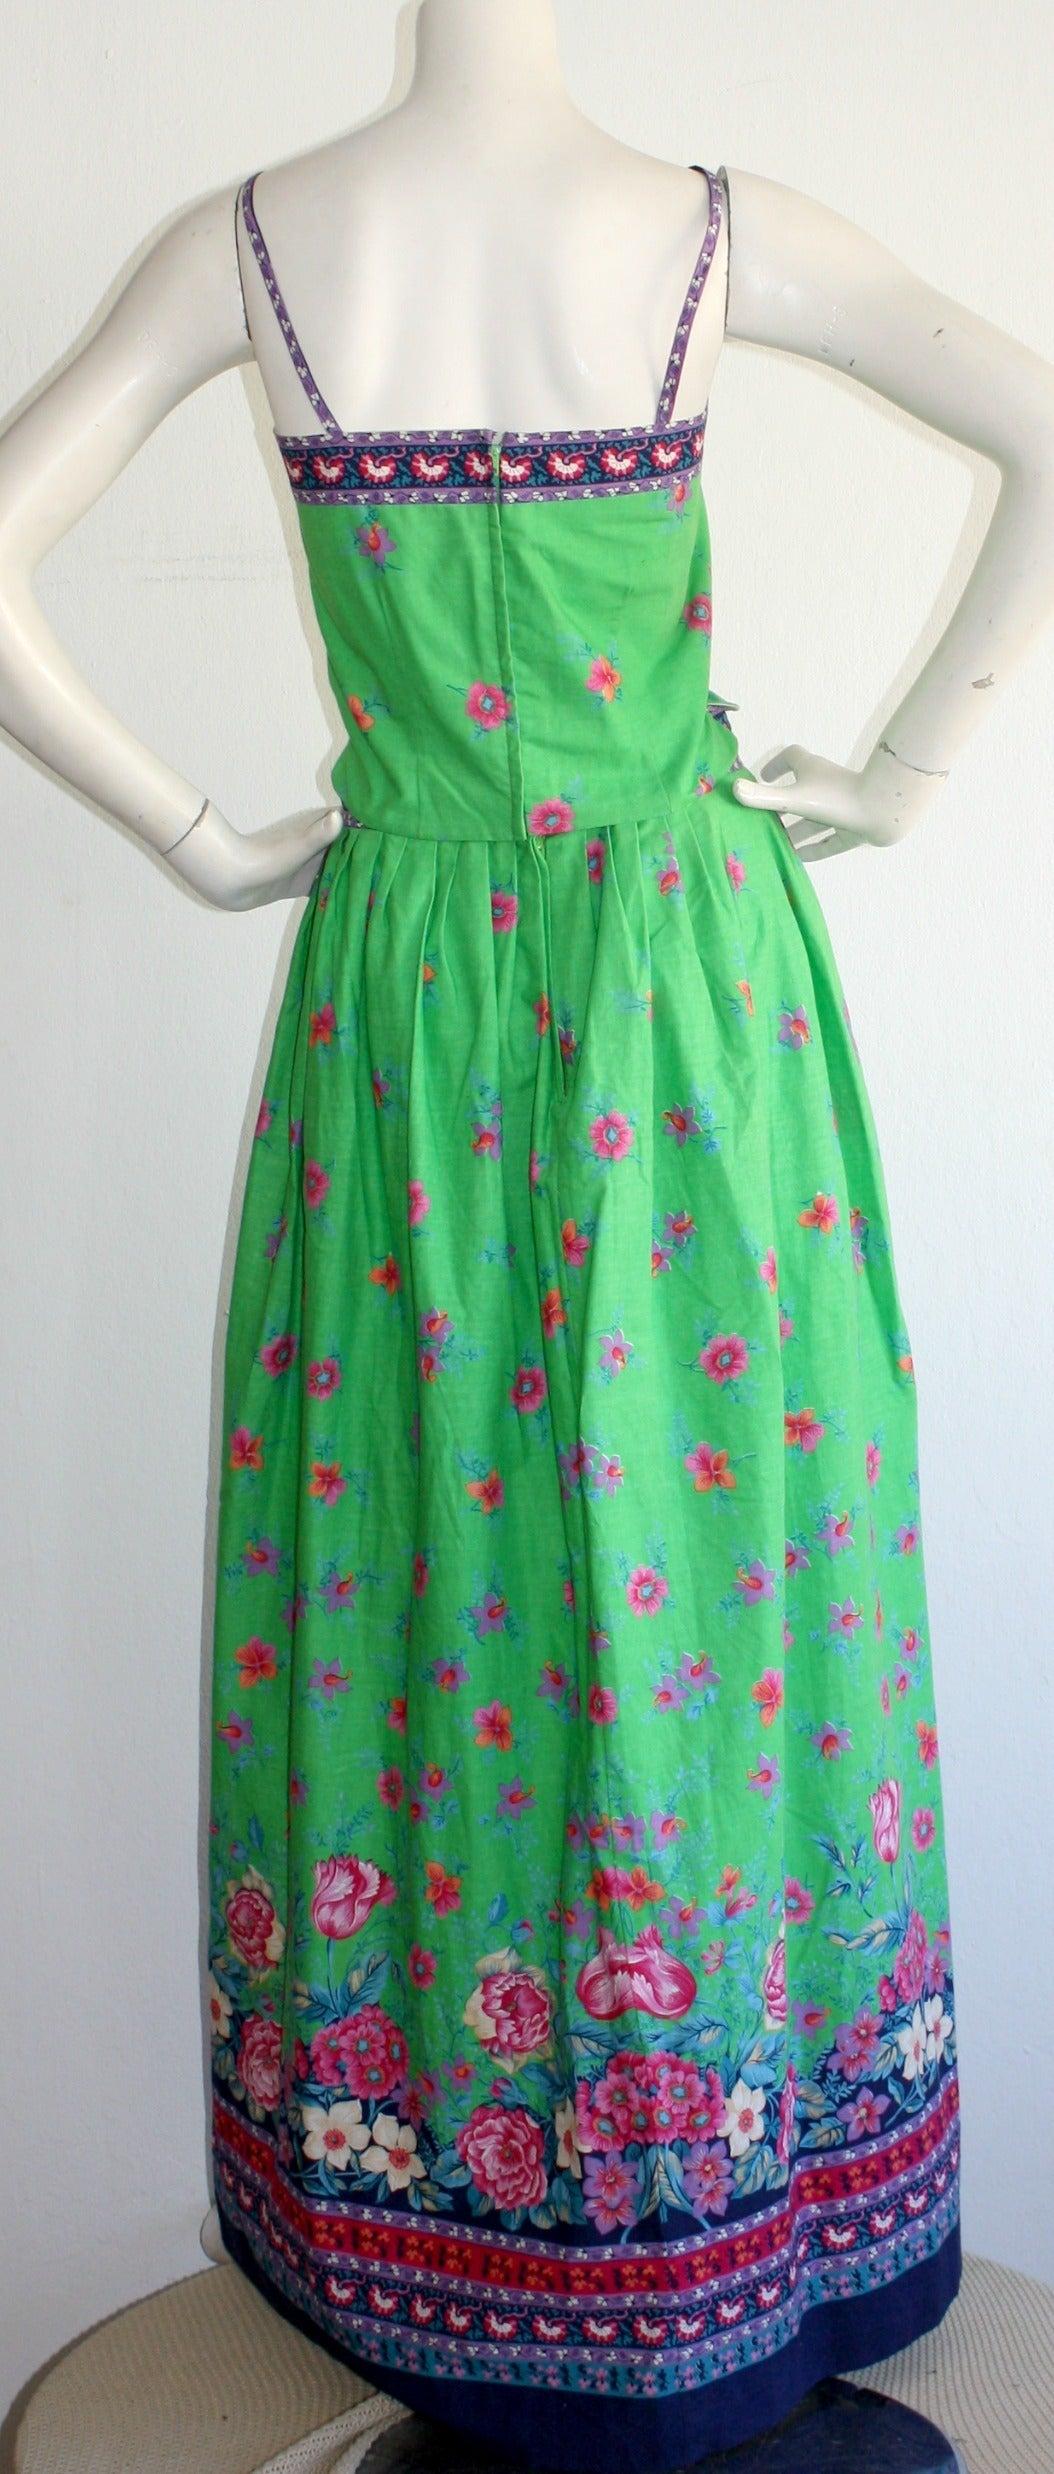 Blue 1960s Vintage Tina Leser Green Floral Print 2 - Piece Dress Ensemble For Sale